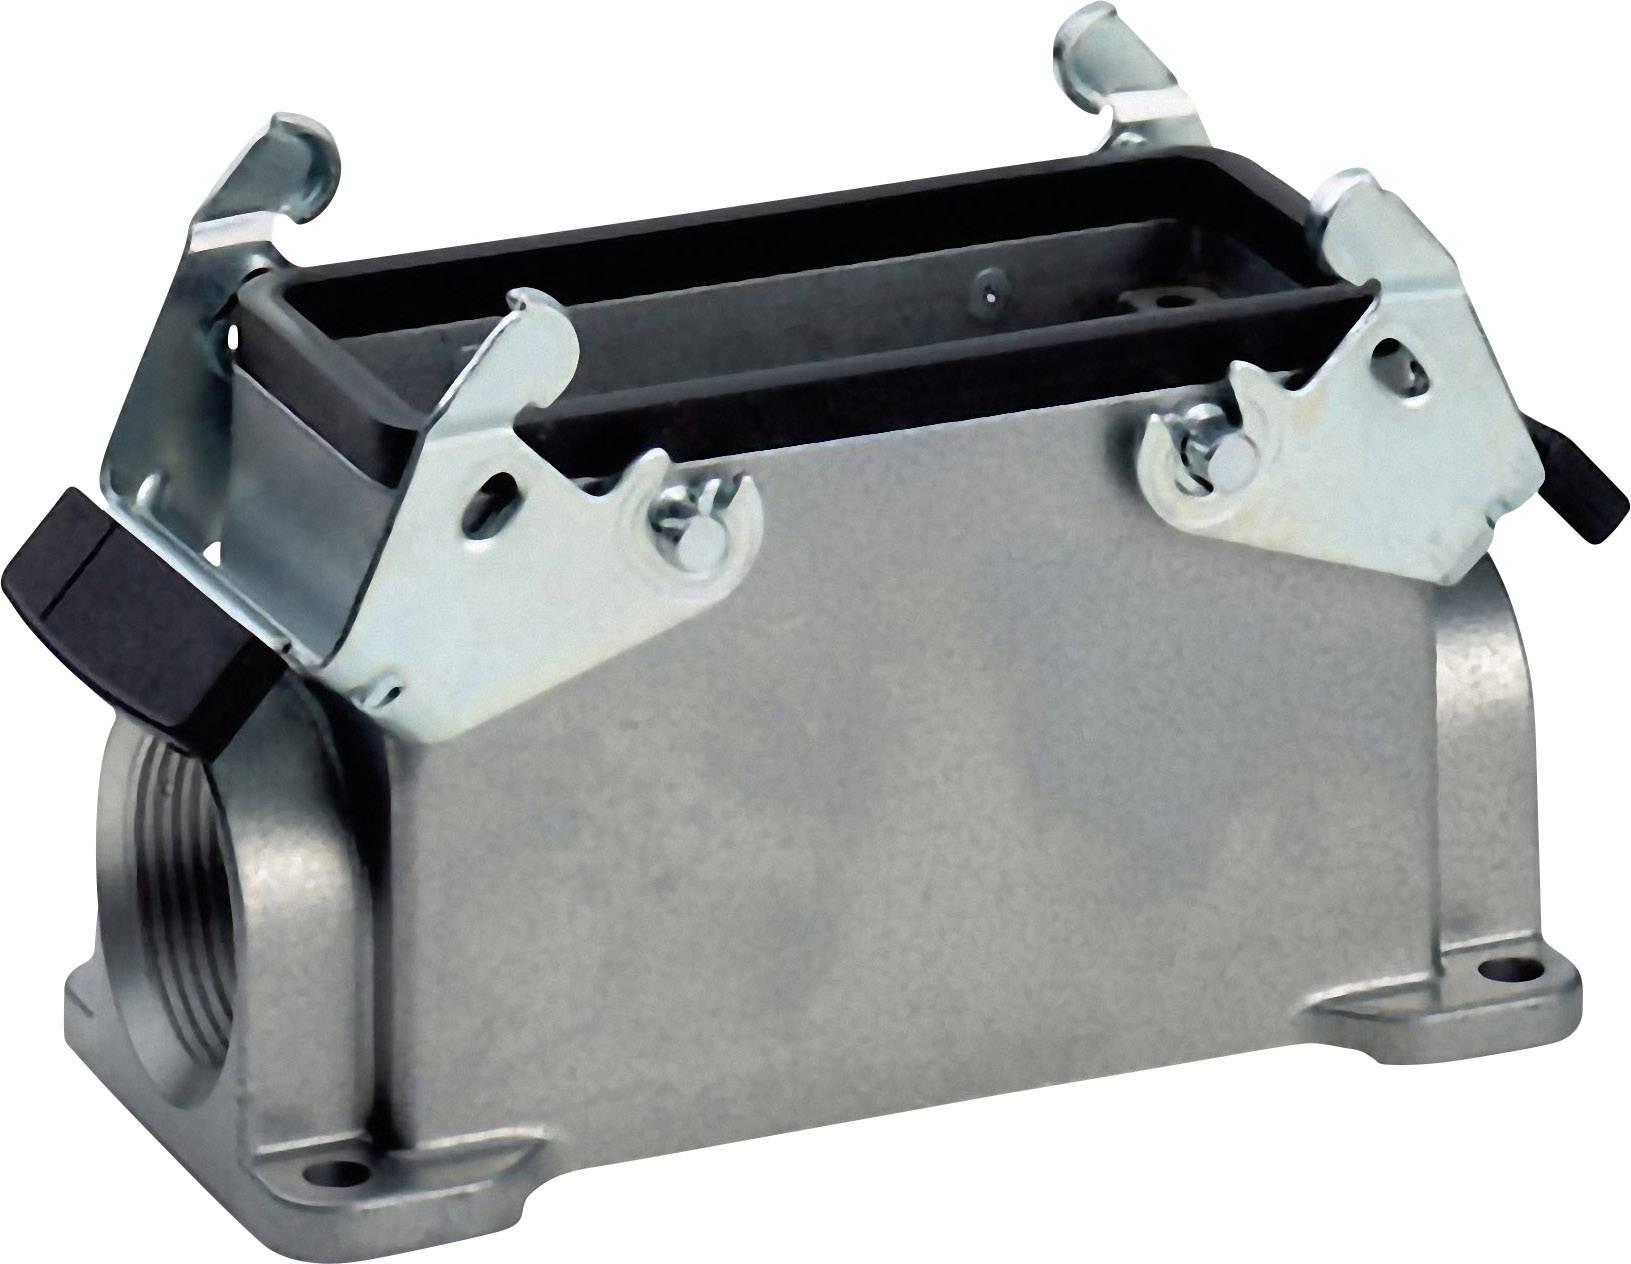 LappKabel EPIC® H-B 16 SGRL M25 ZW. (19075000), IP65, šedá